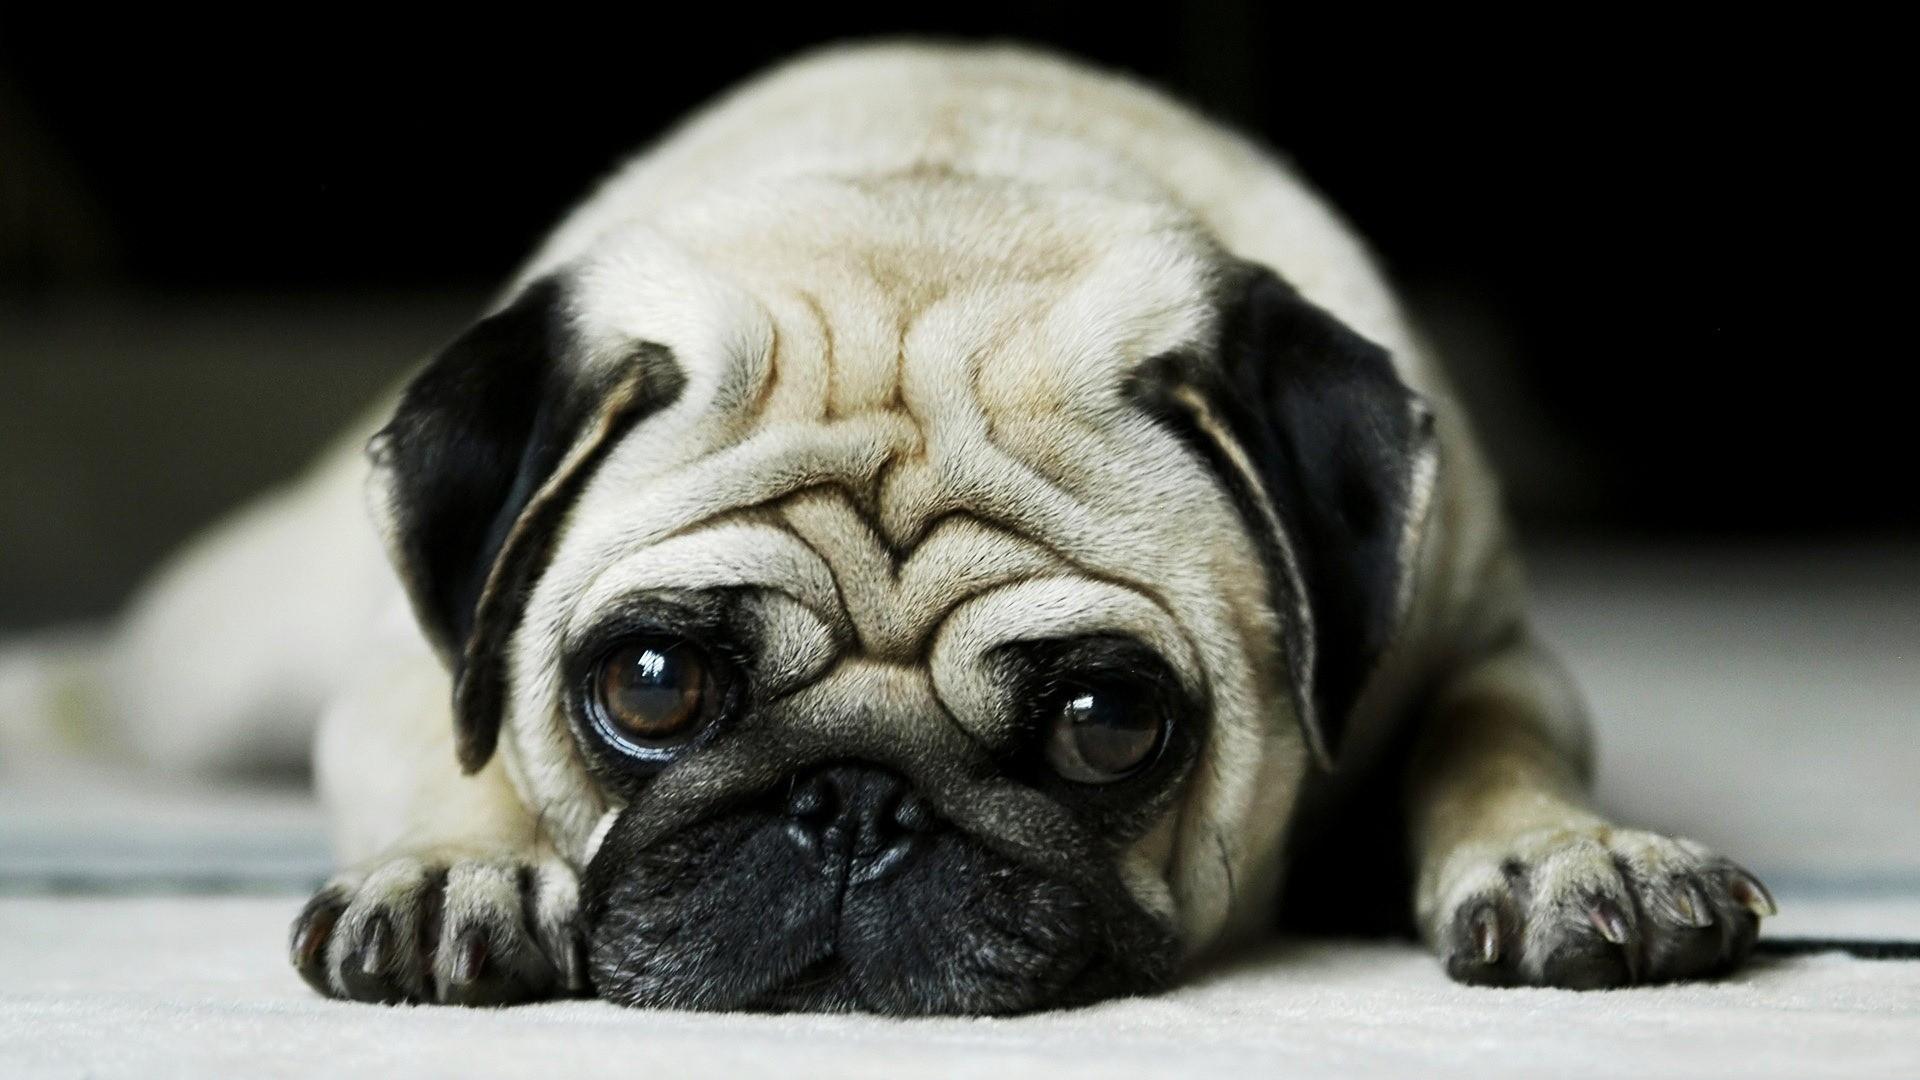 HD Dogs Wallpapers and Photos HD Animals Wallpapers 900×506 Wallpaper Dog  (42 Wallpapers)   Adorable Wallpapers   Desktop   Pinterest   Dog wallpaper,  …